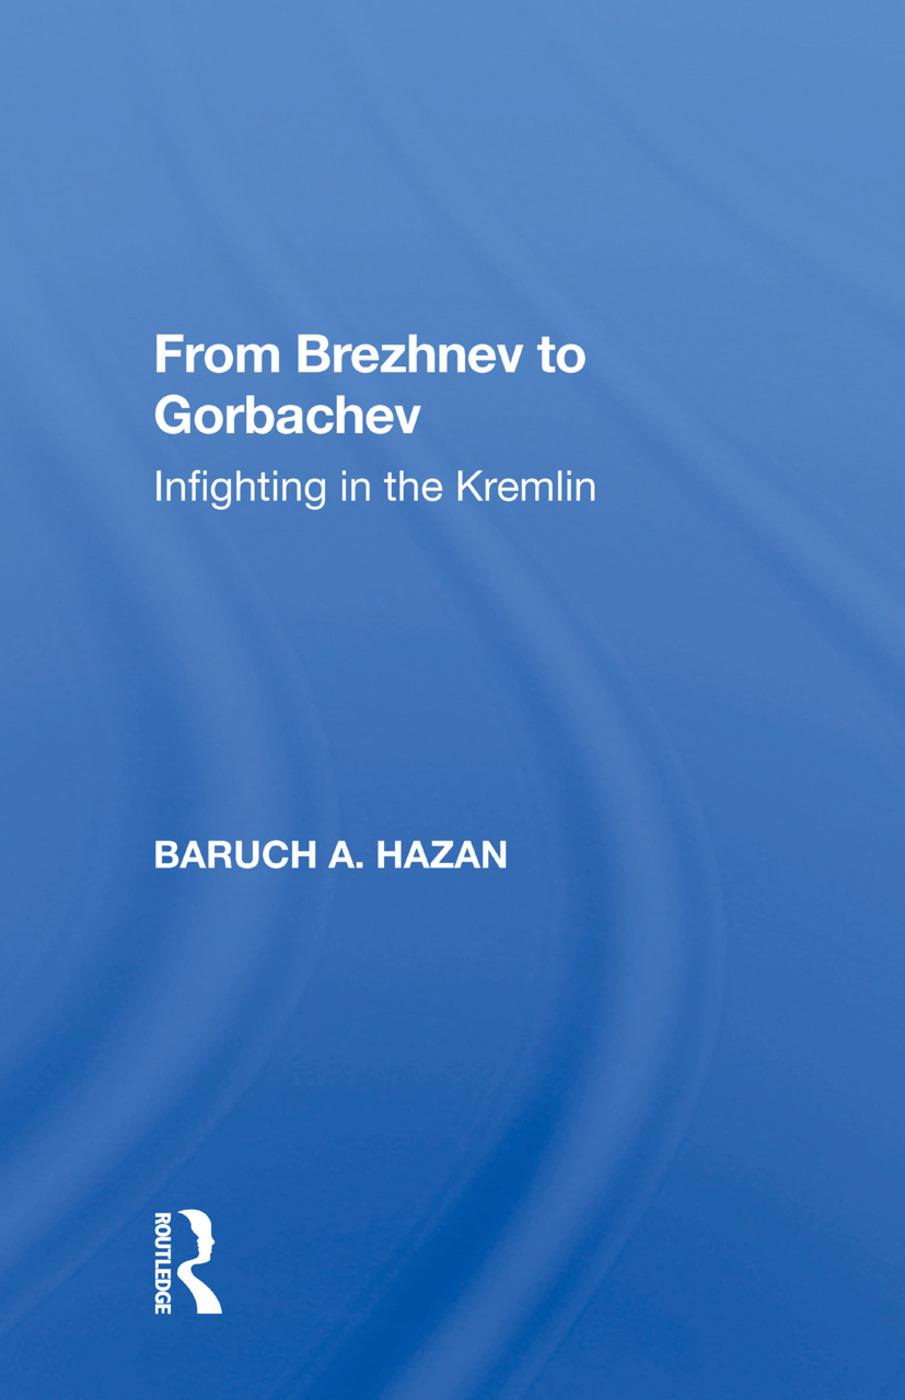 From Brezhnev To Gorbachev: Infighting In The Kremlin, 1st Edition (Paperback) book cover